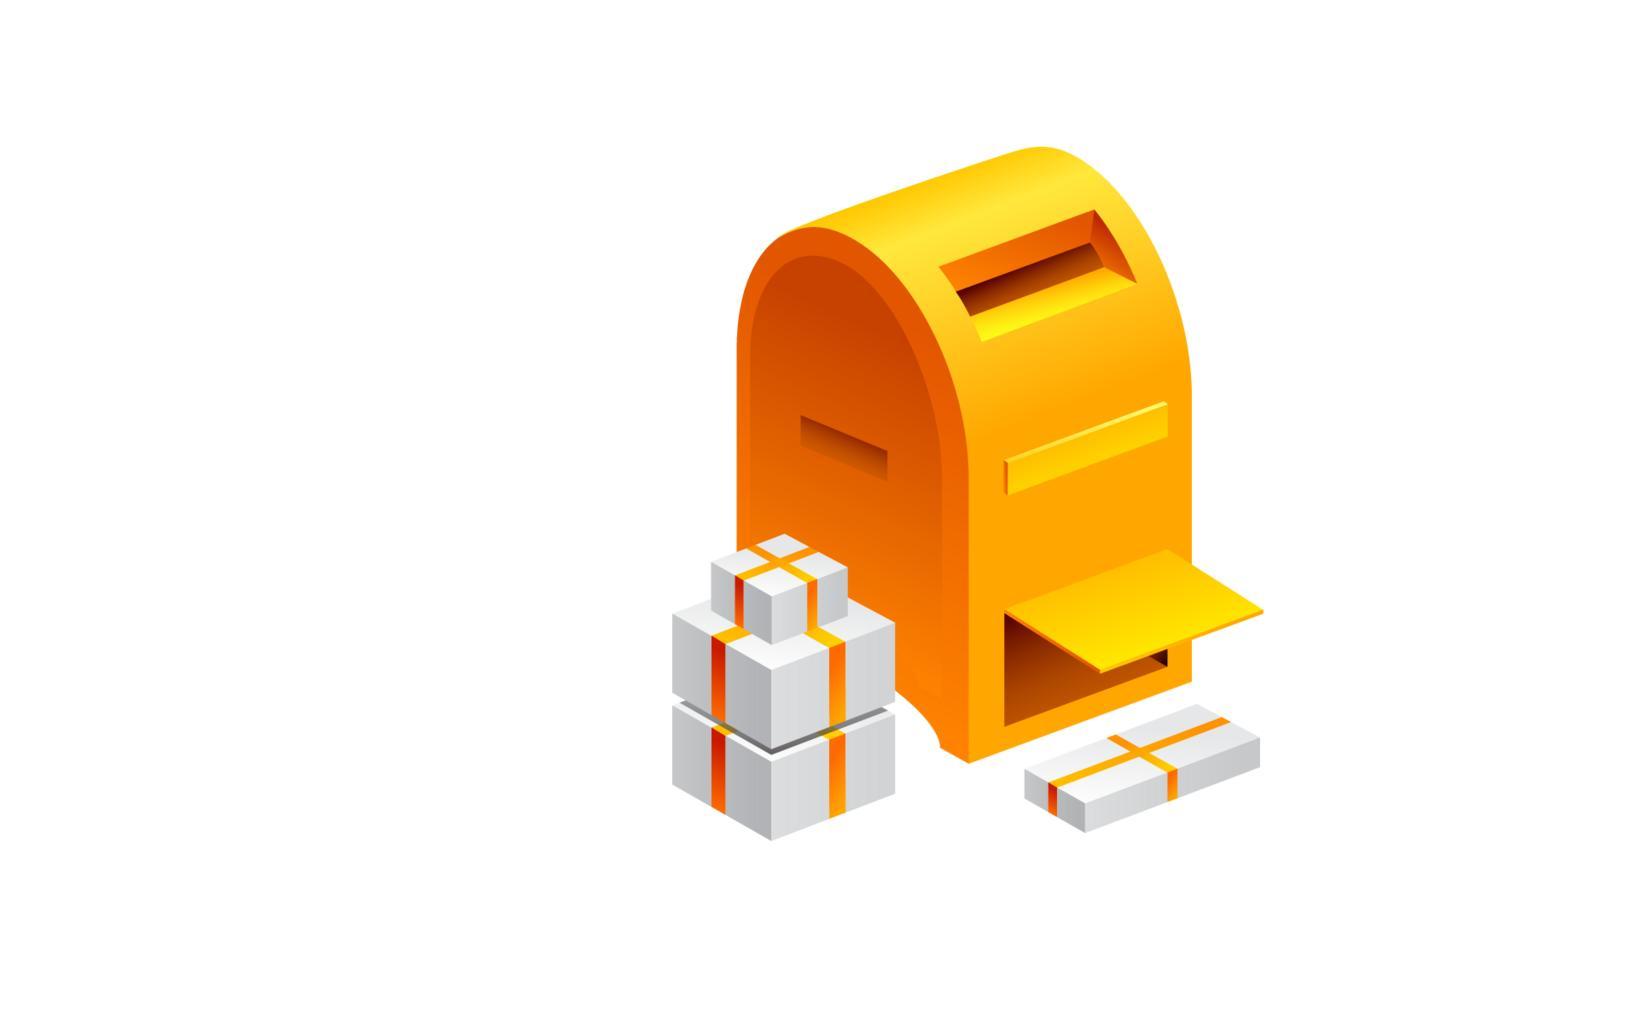 schránka a balíky